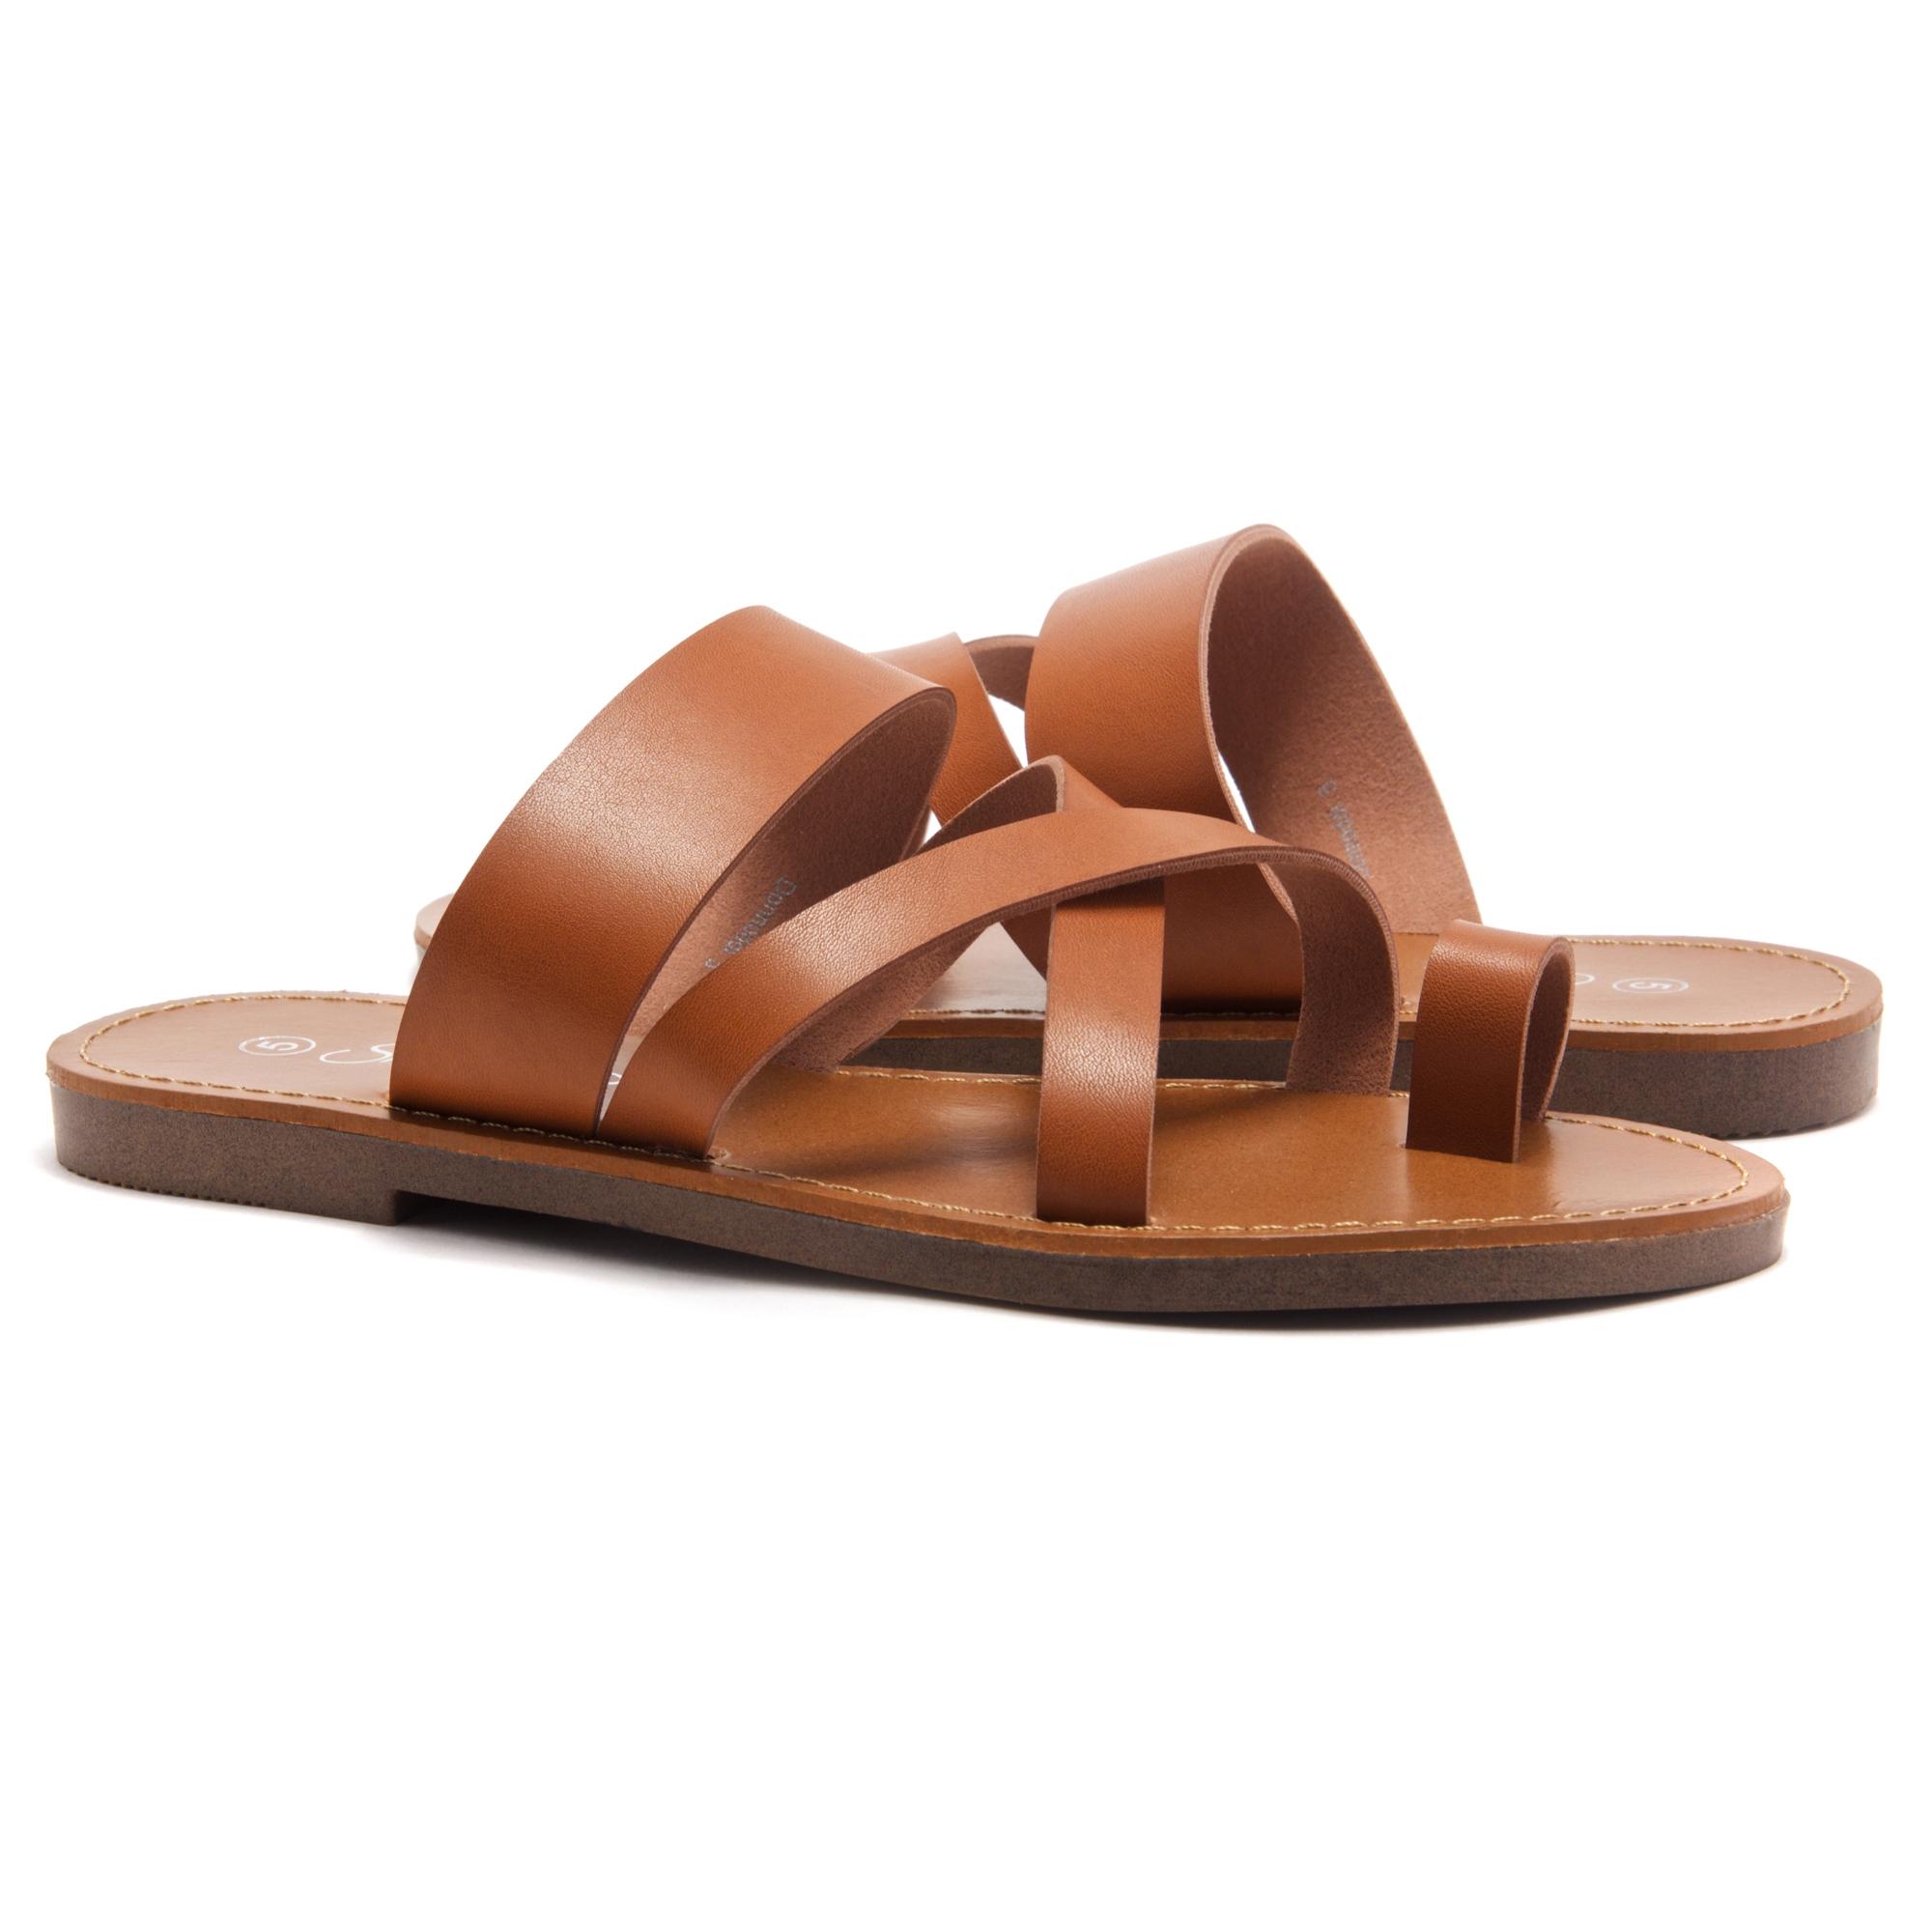 efdf6e8854 Women's Donnoddi Toe Ring Sandal with Unique Crisscross Straps (Cognac)